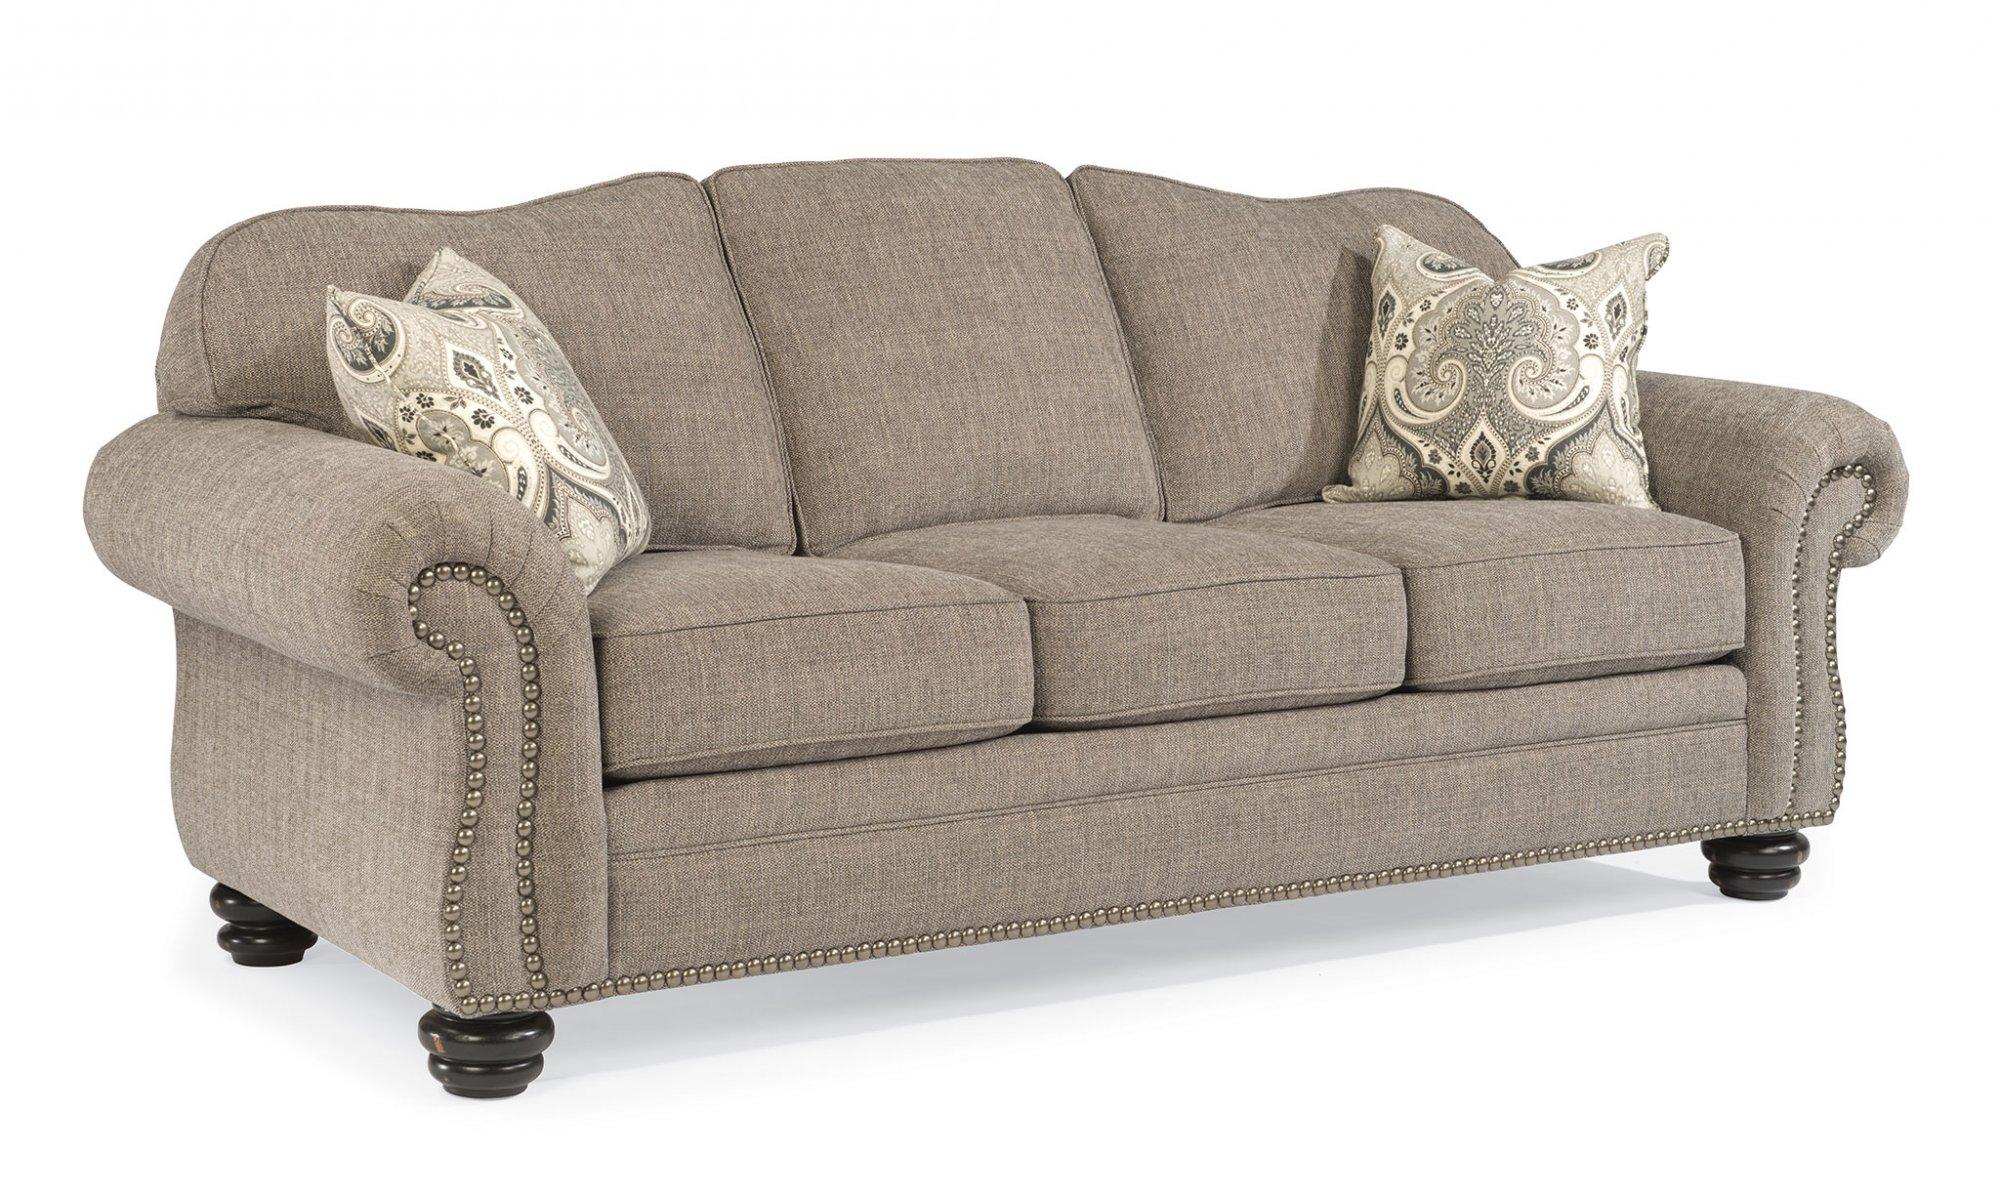 flexsteel sofa share via email download a high-resolution image WCSVDKF